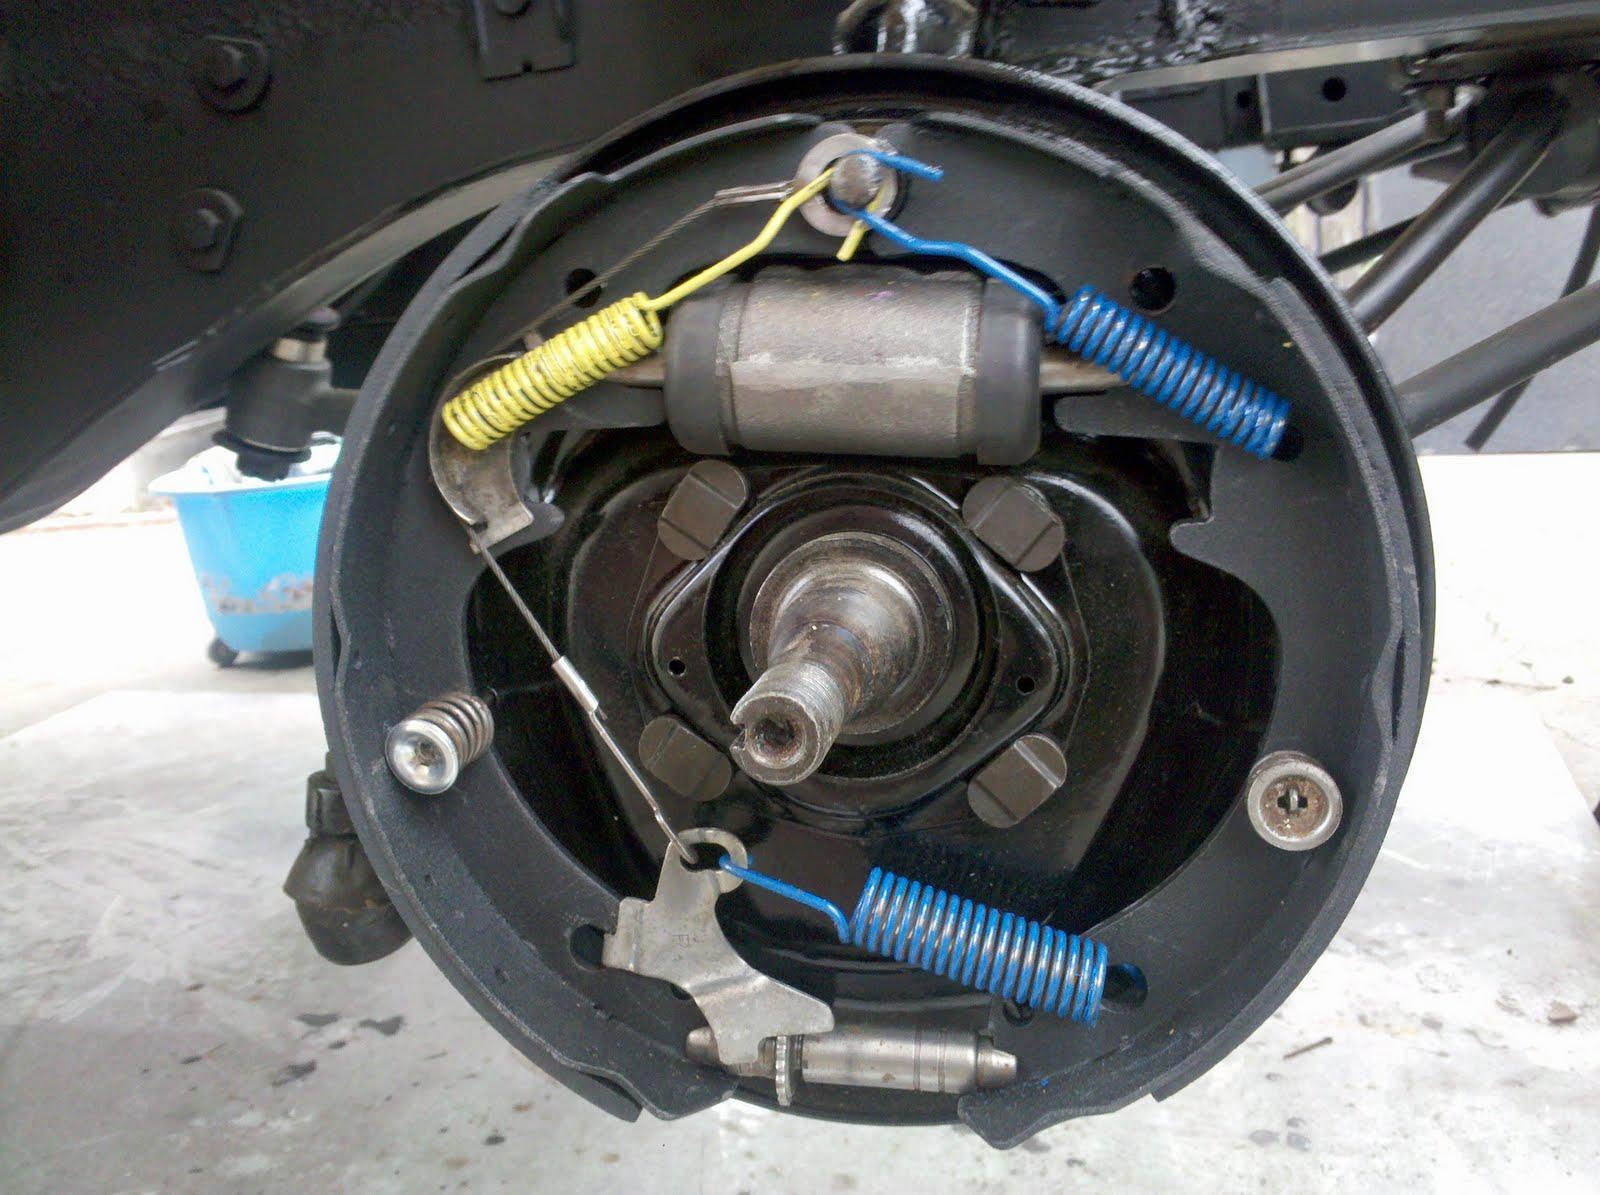 LeLu's 66 Mustang: Brakes, Seals & Bearings